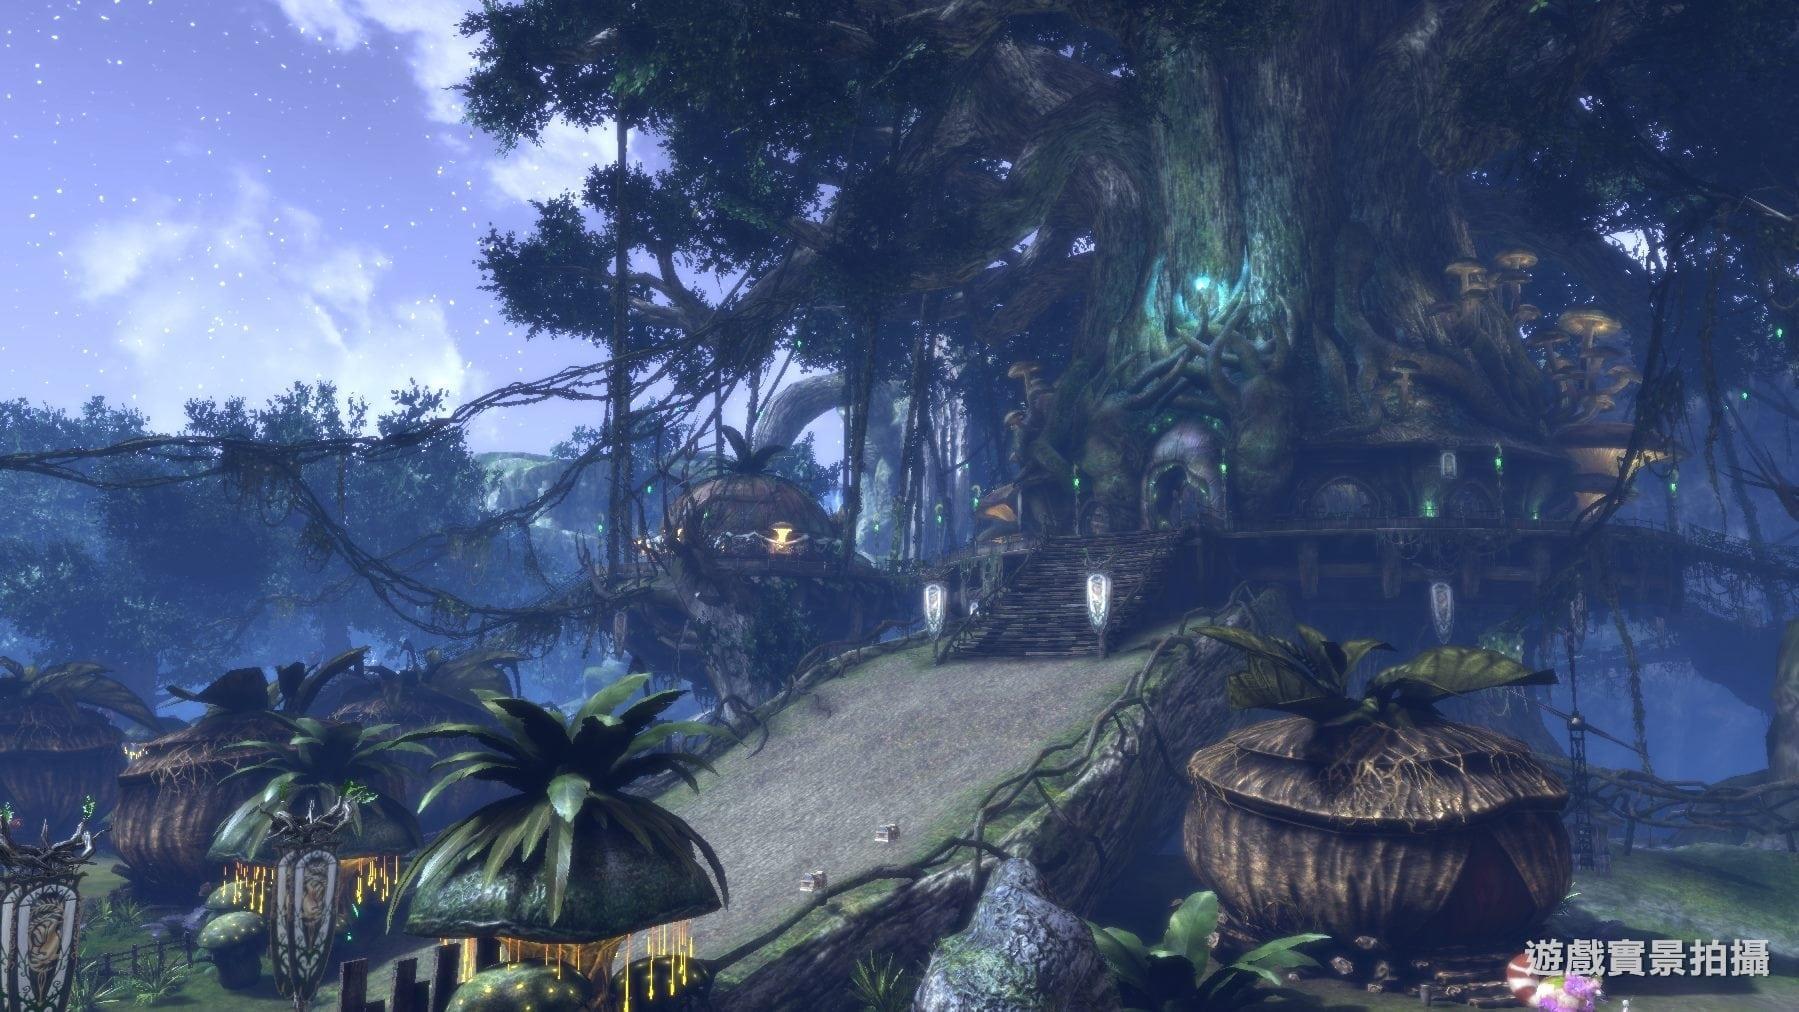 The Age of Heroes screenshot 3